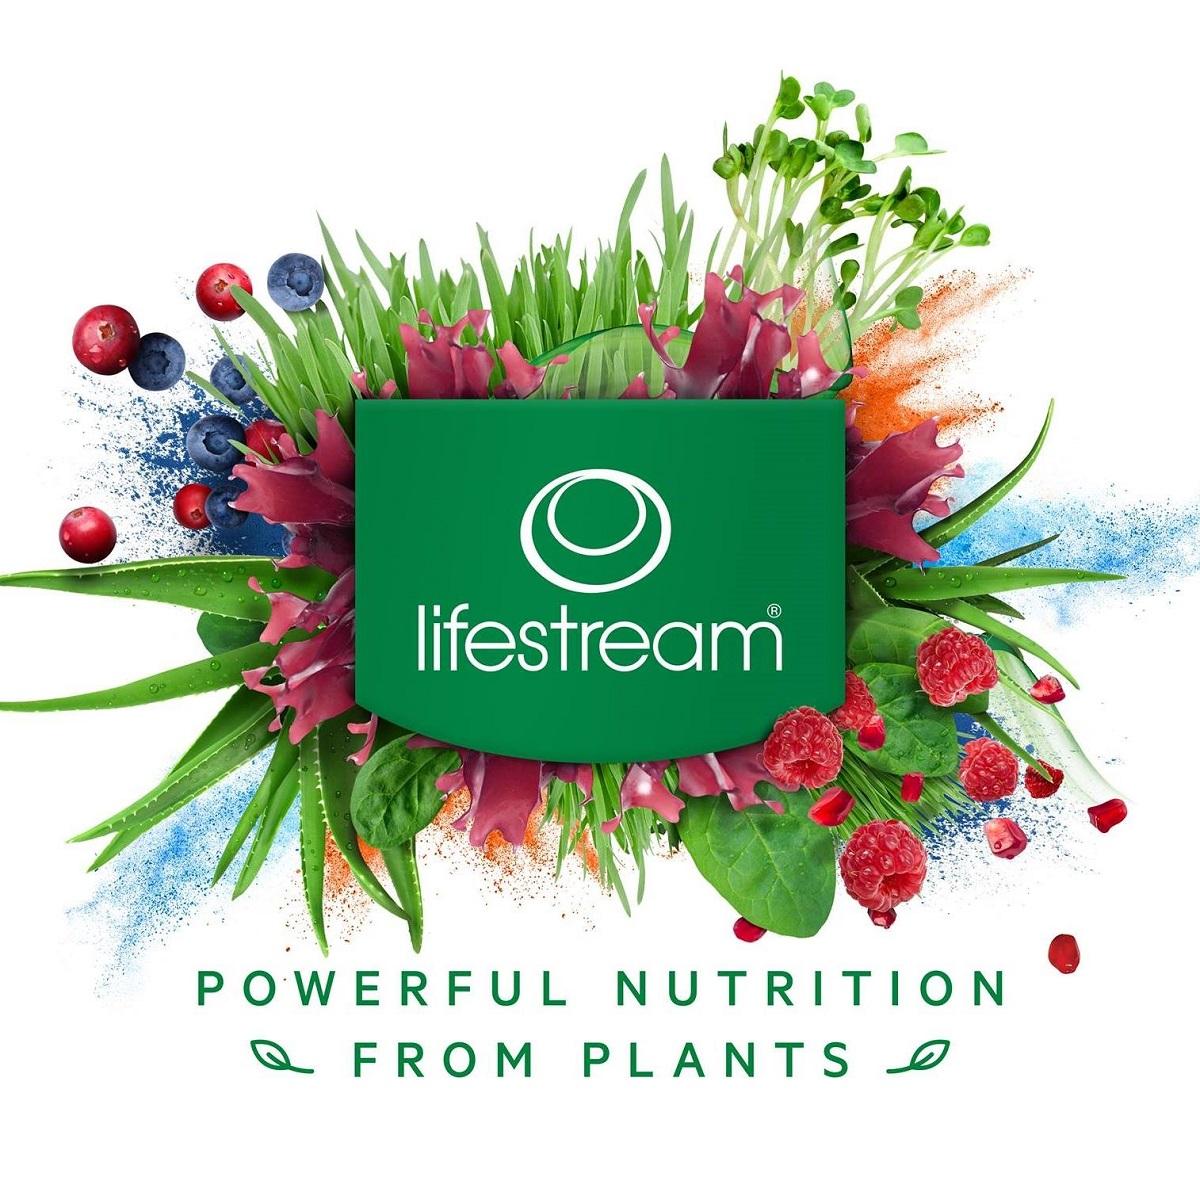 LifeStream V Omega 3 (Algae Source DHA EPA and Vit D3)